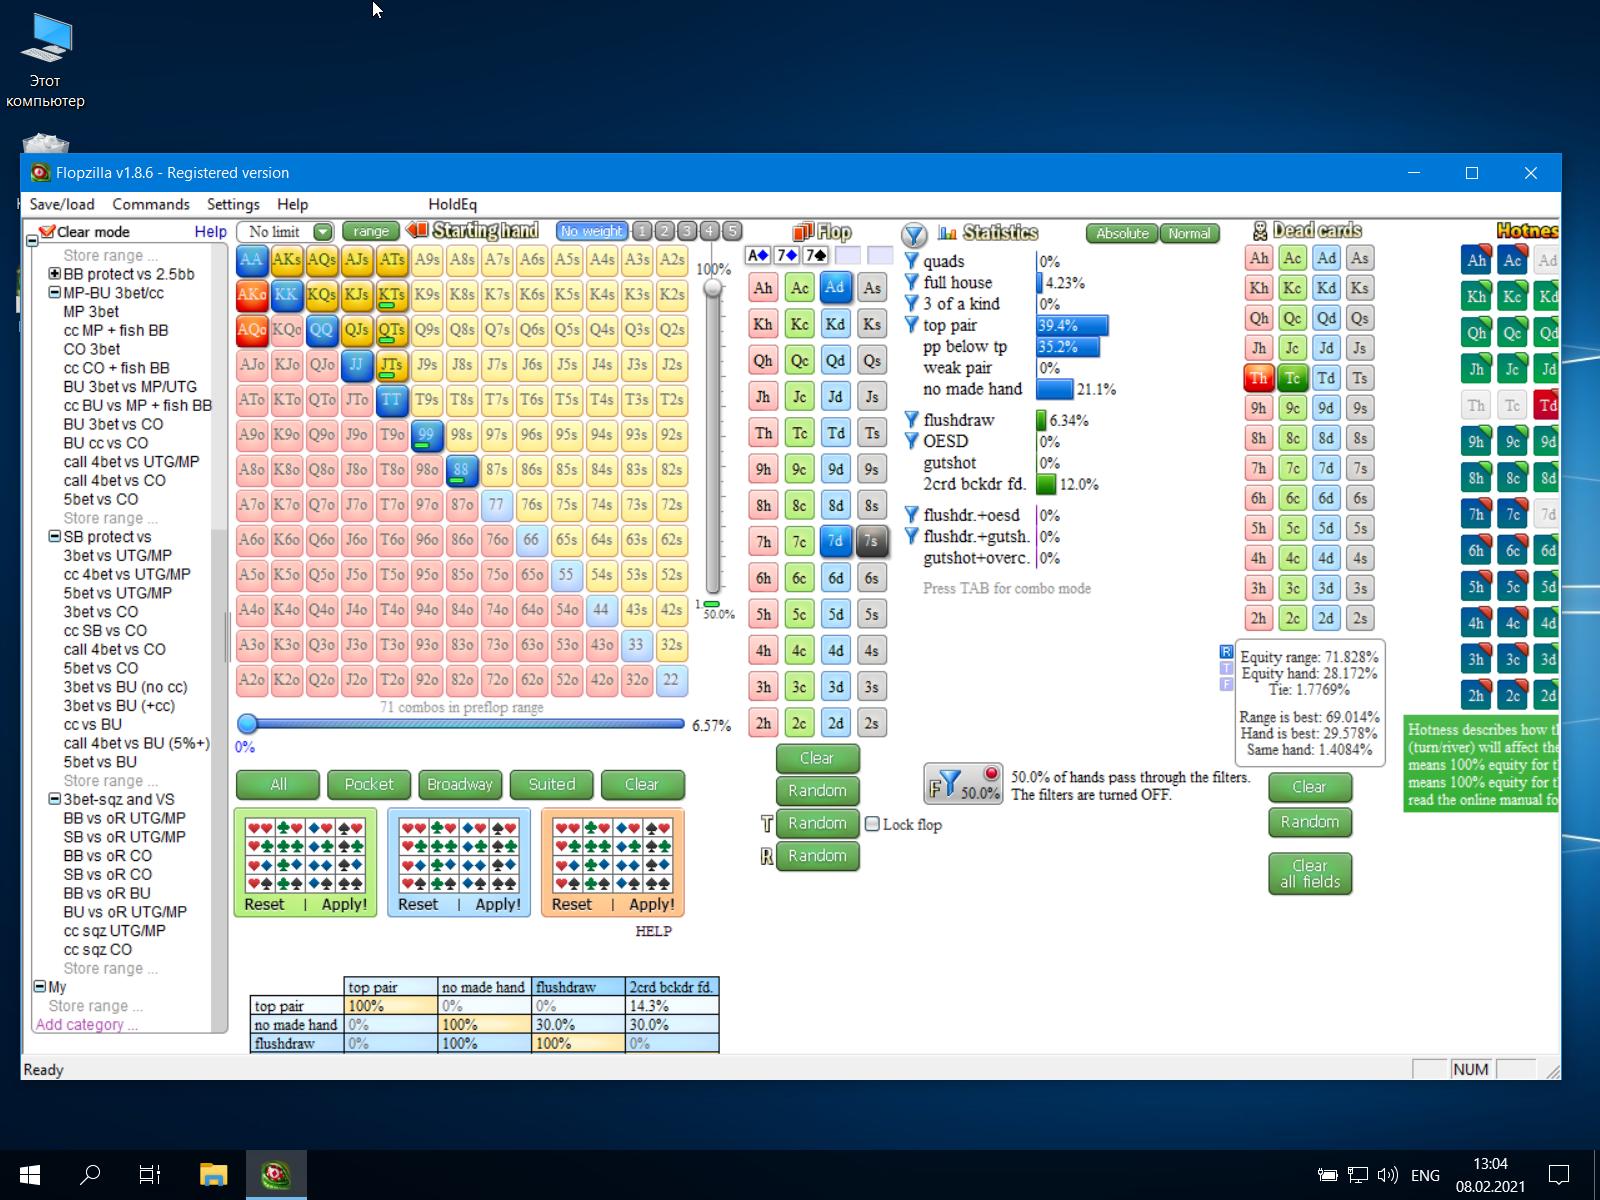 virtualboxwin-10080220211304571612778801.png